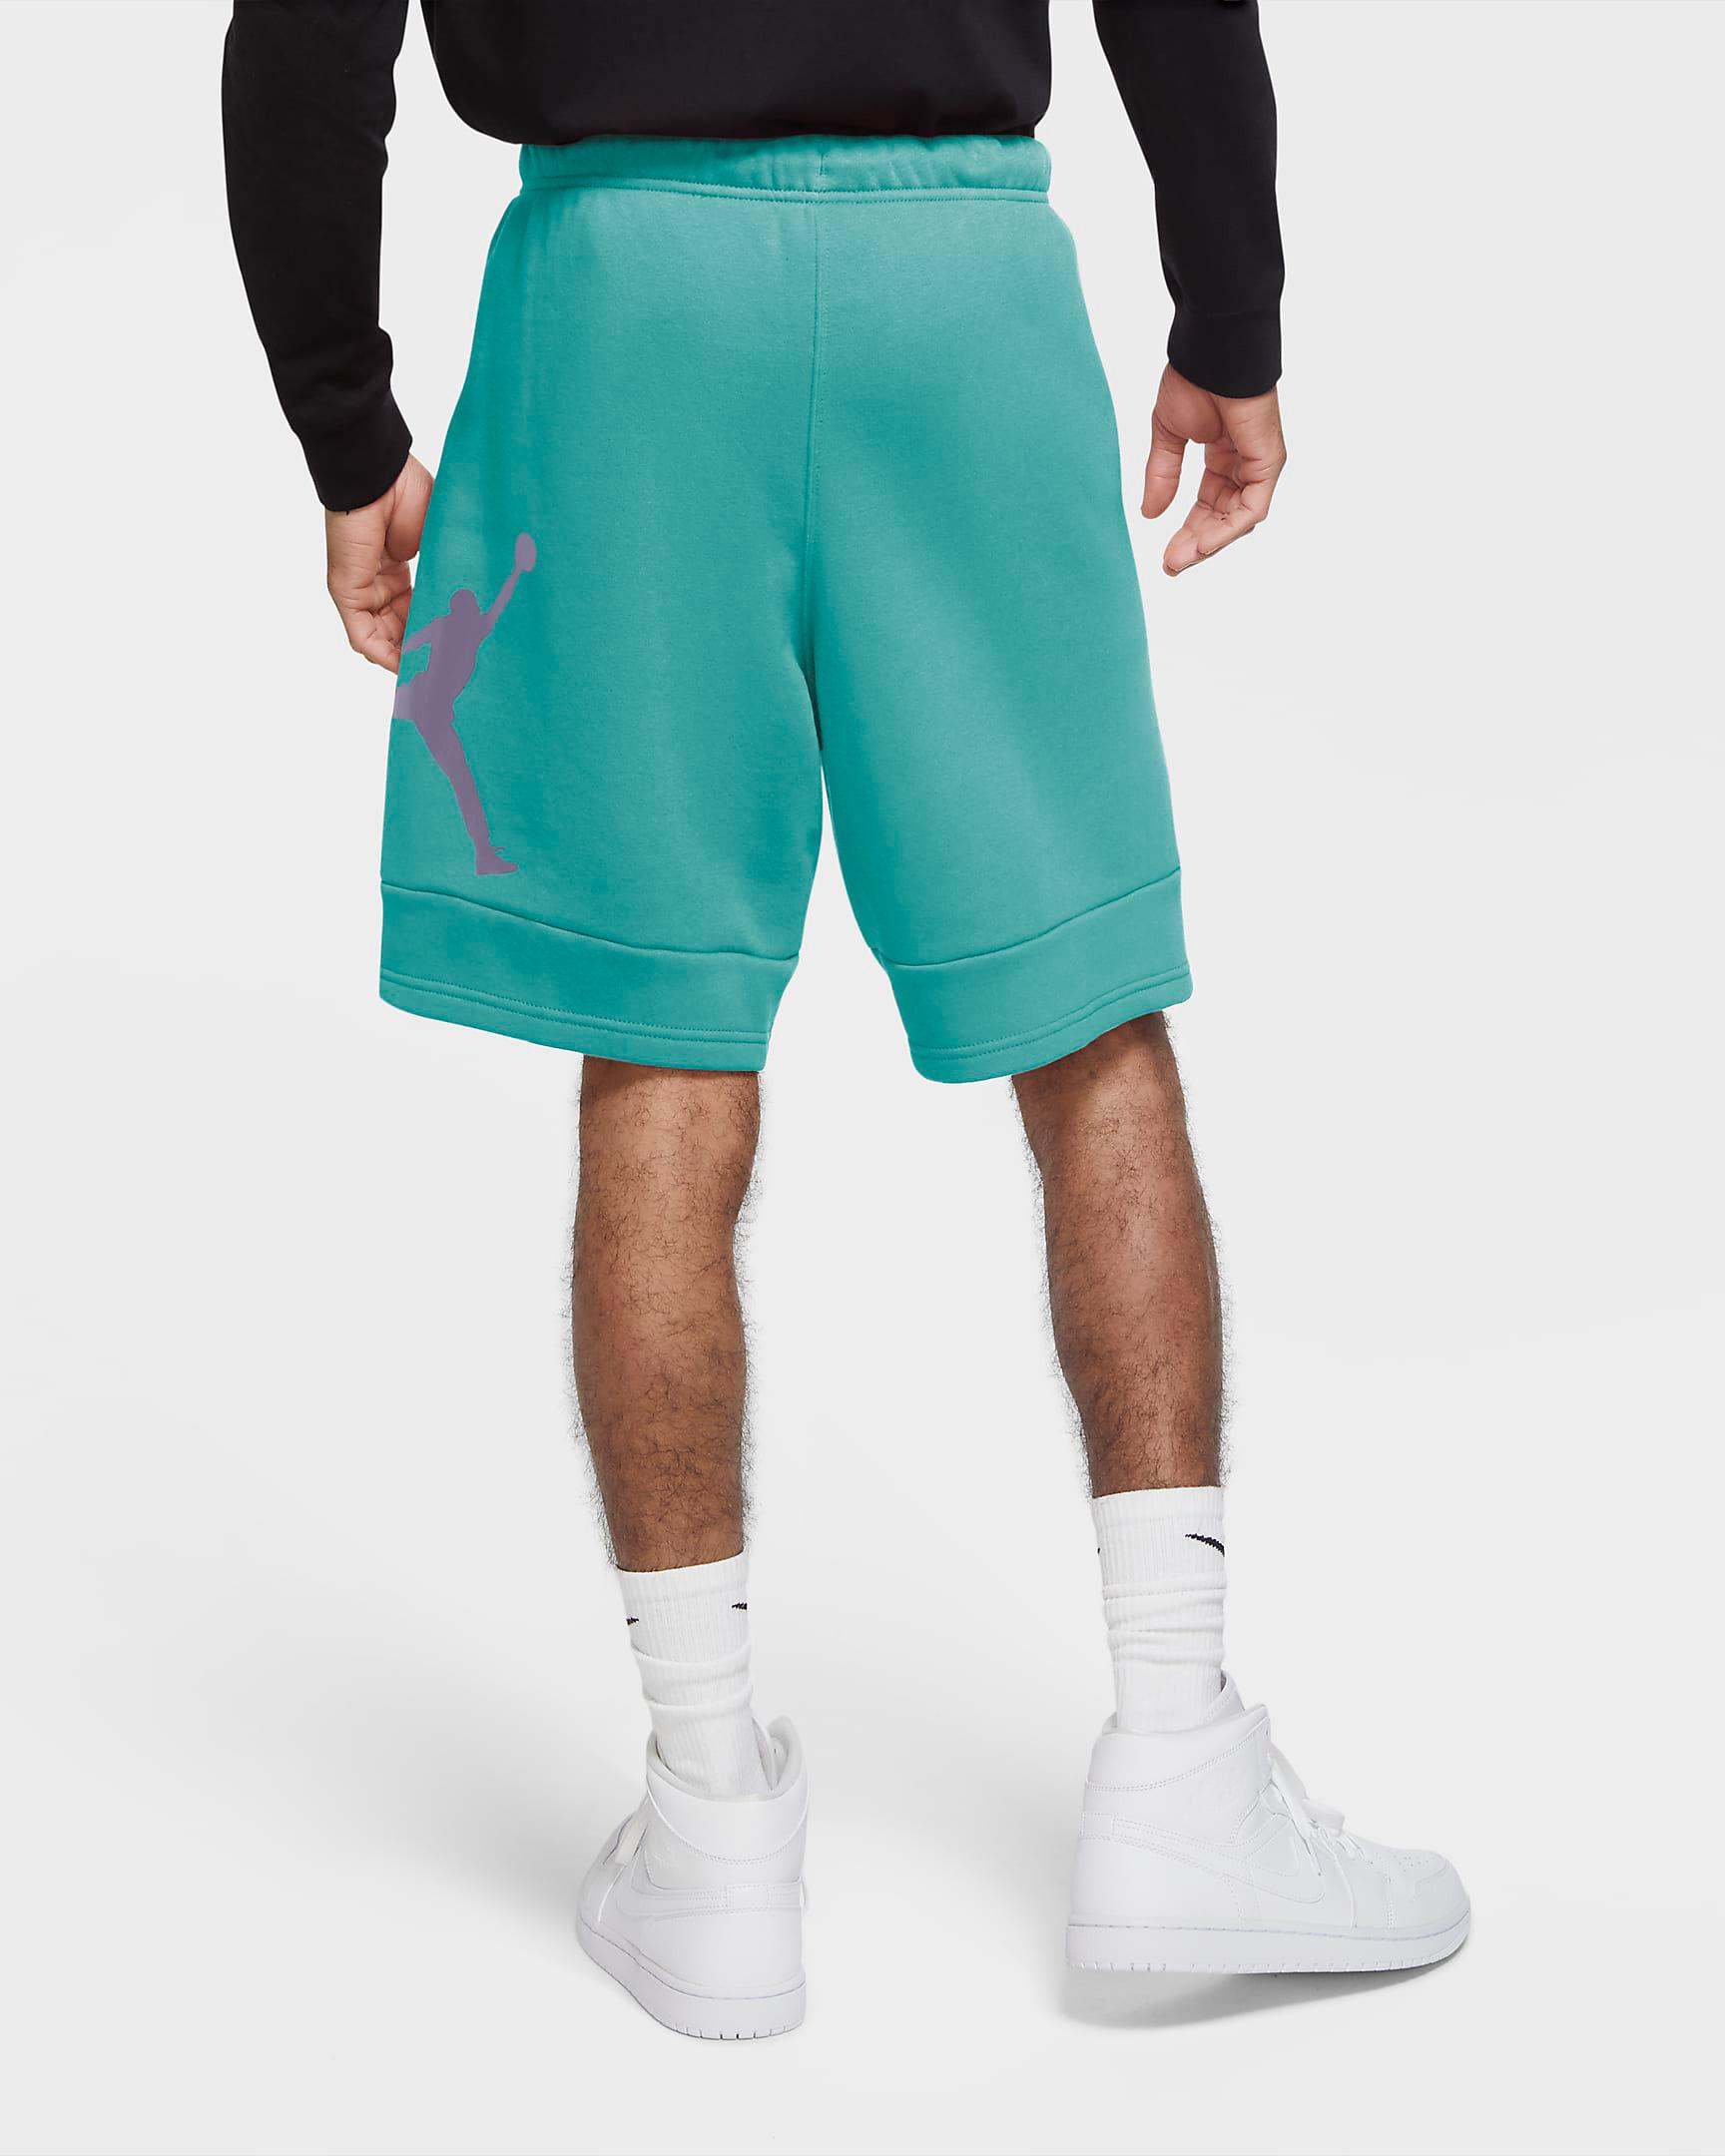 jordan-tropical-twist-jumpman-air-fleece-shorts-2